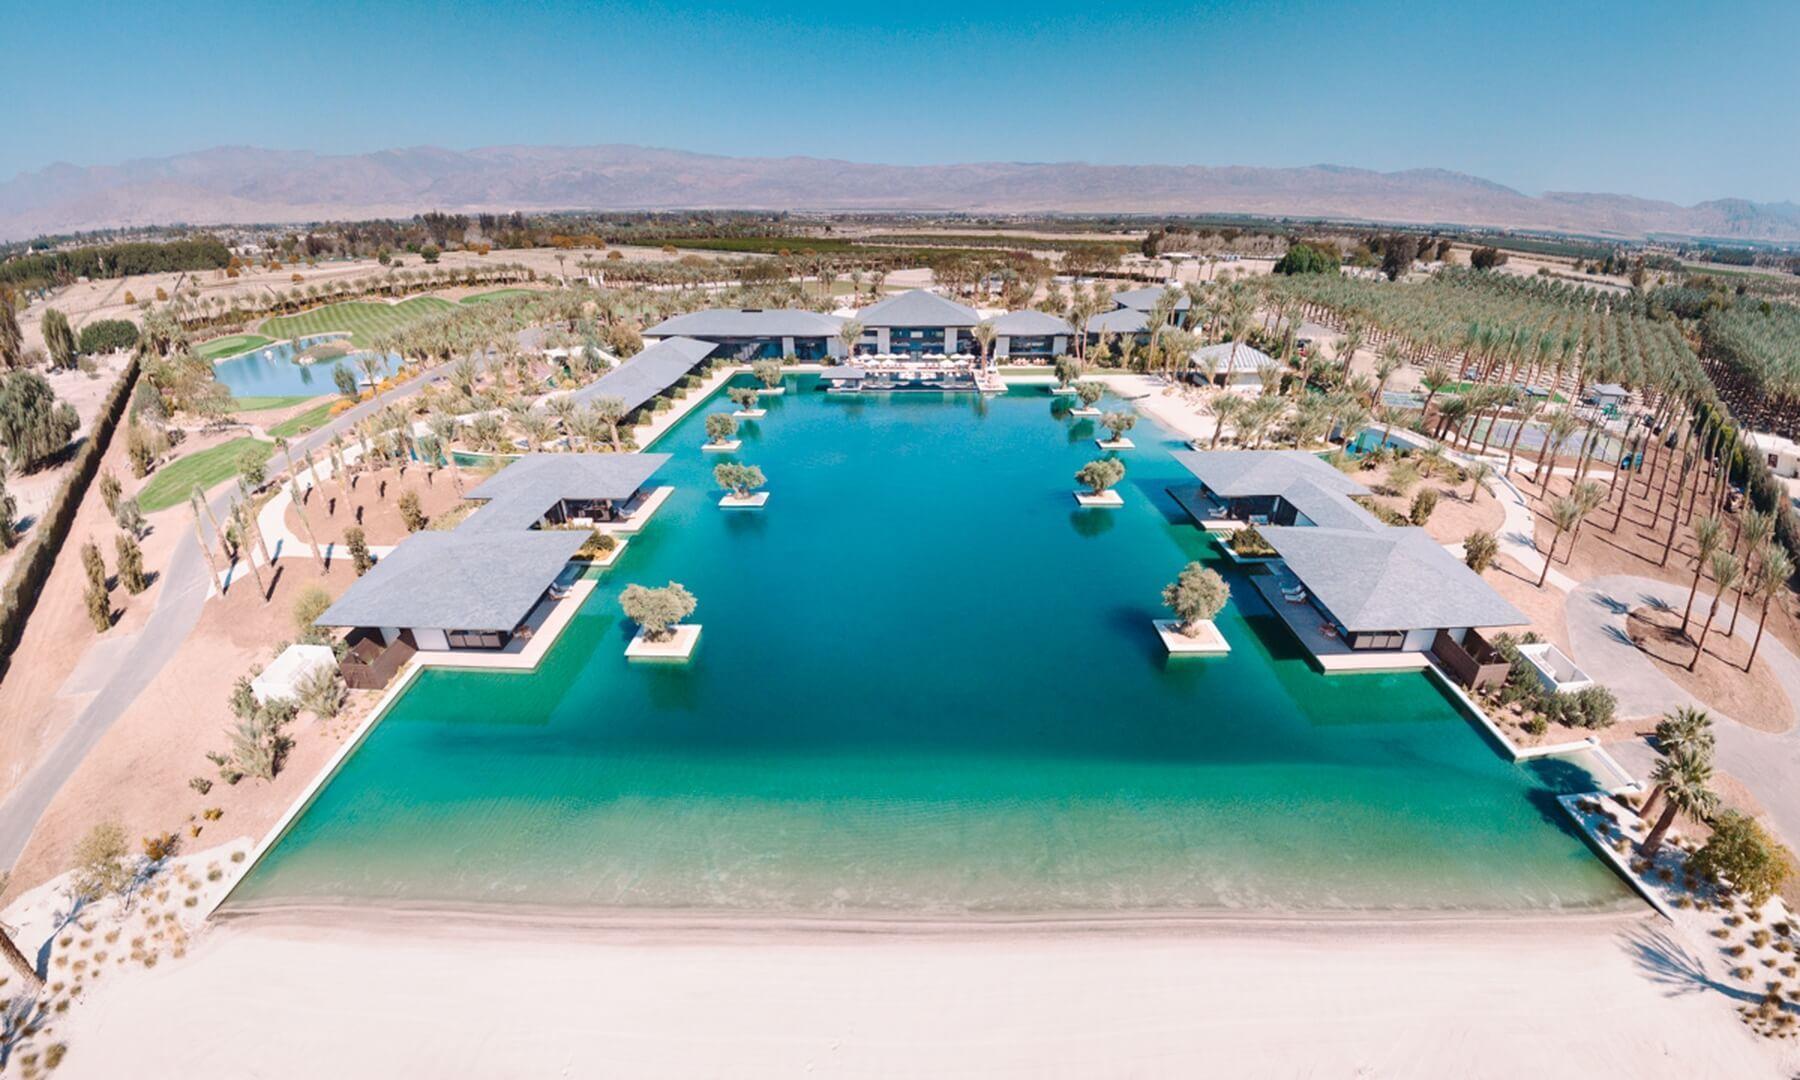 Villa Zenyara Is An Oasis In The Palm Springs Desert Desert